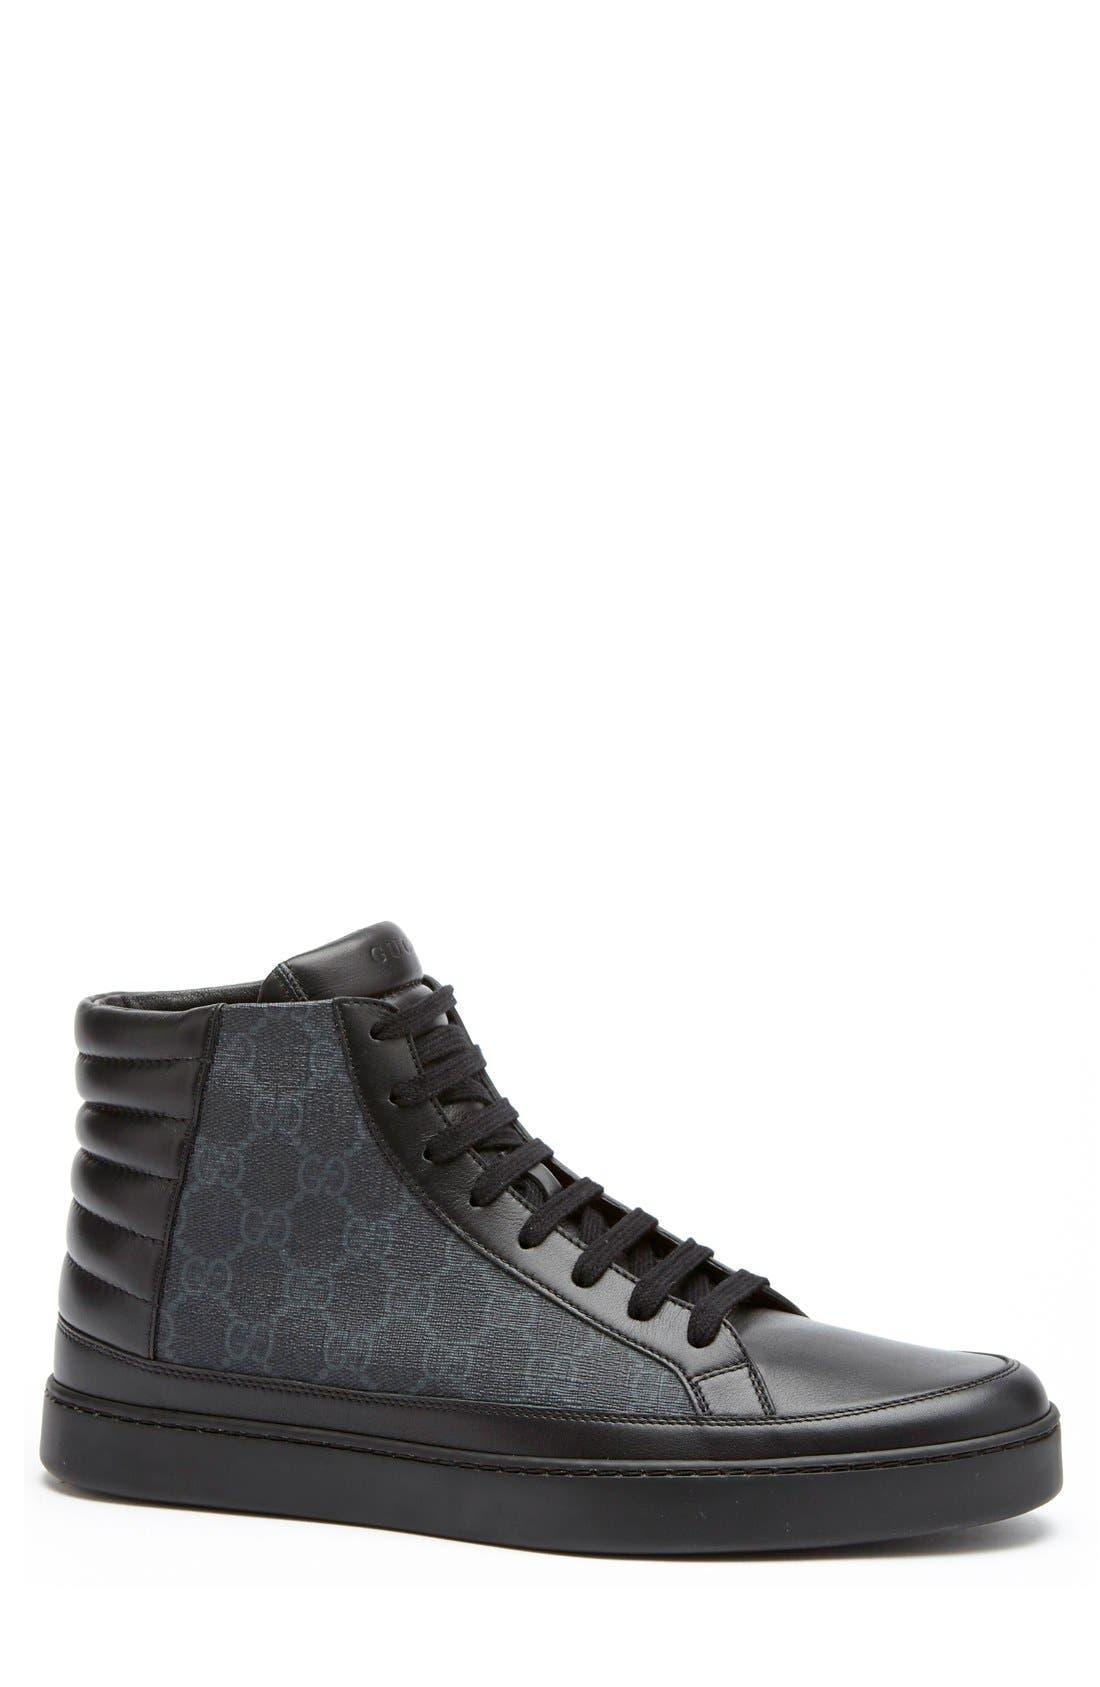 Alternate Image 3  - Gucci 'Common' High Top Sneaker (Men)